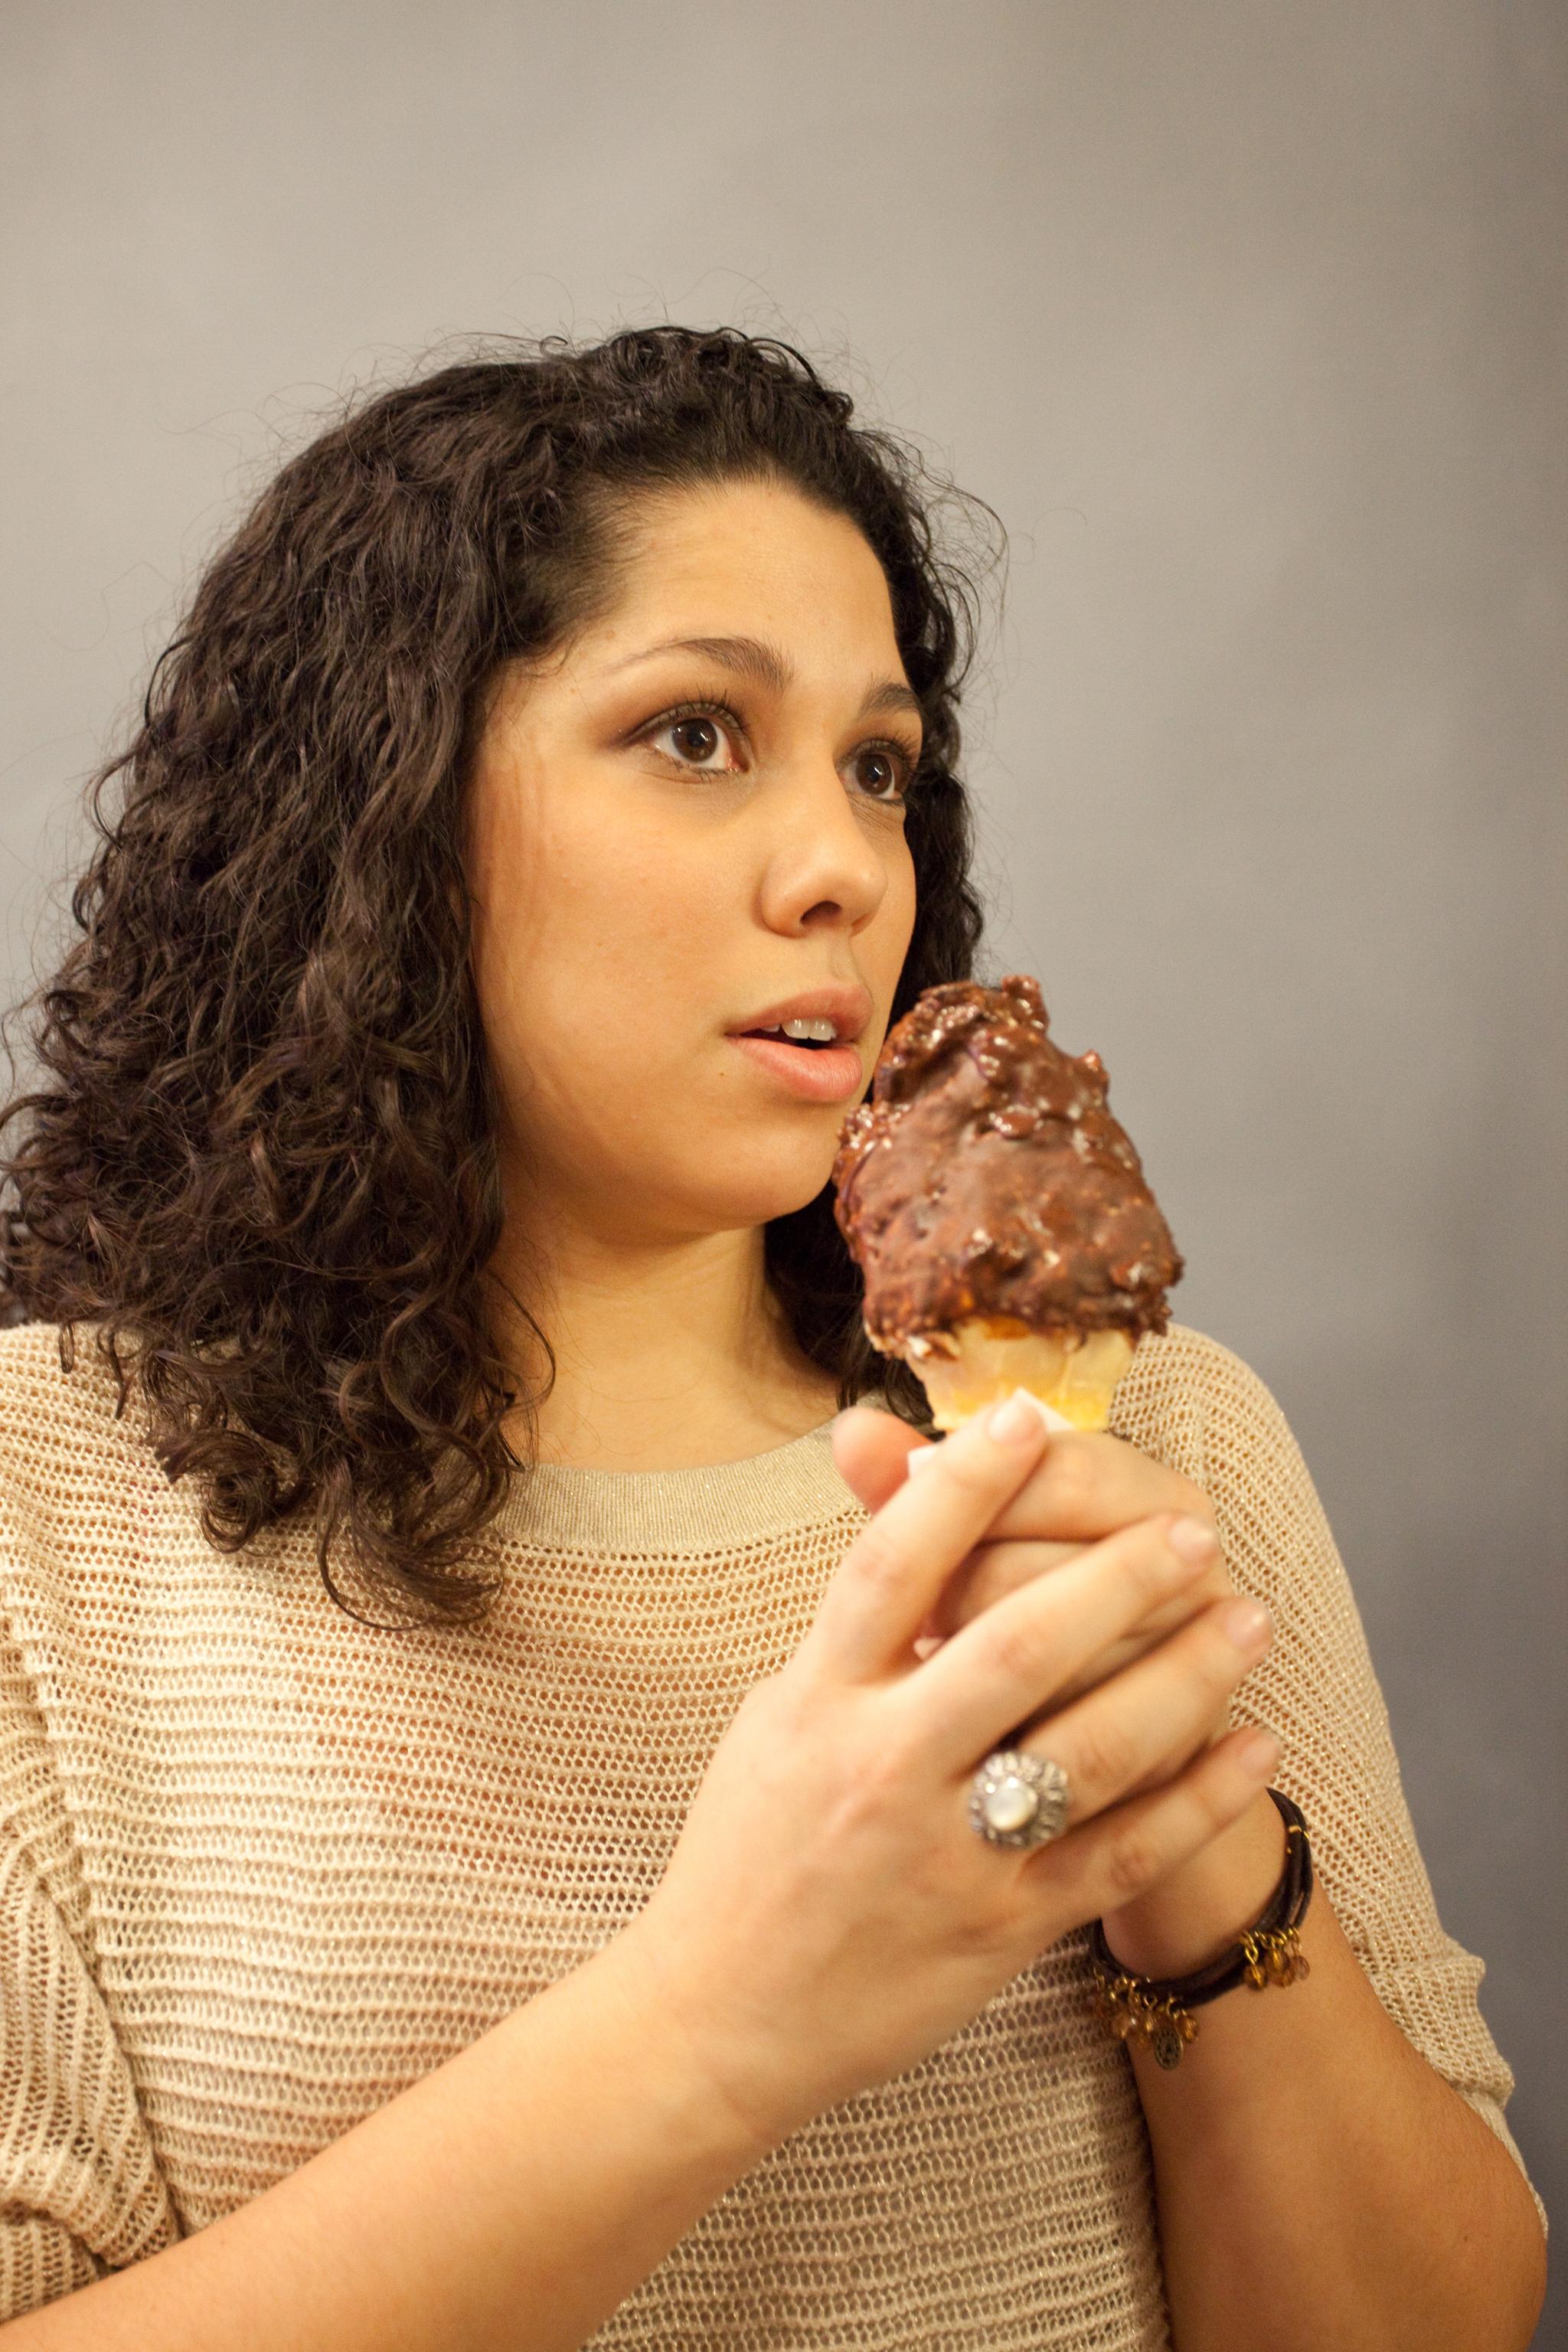 big gay ice cream in nyc